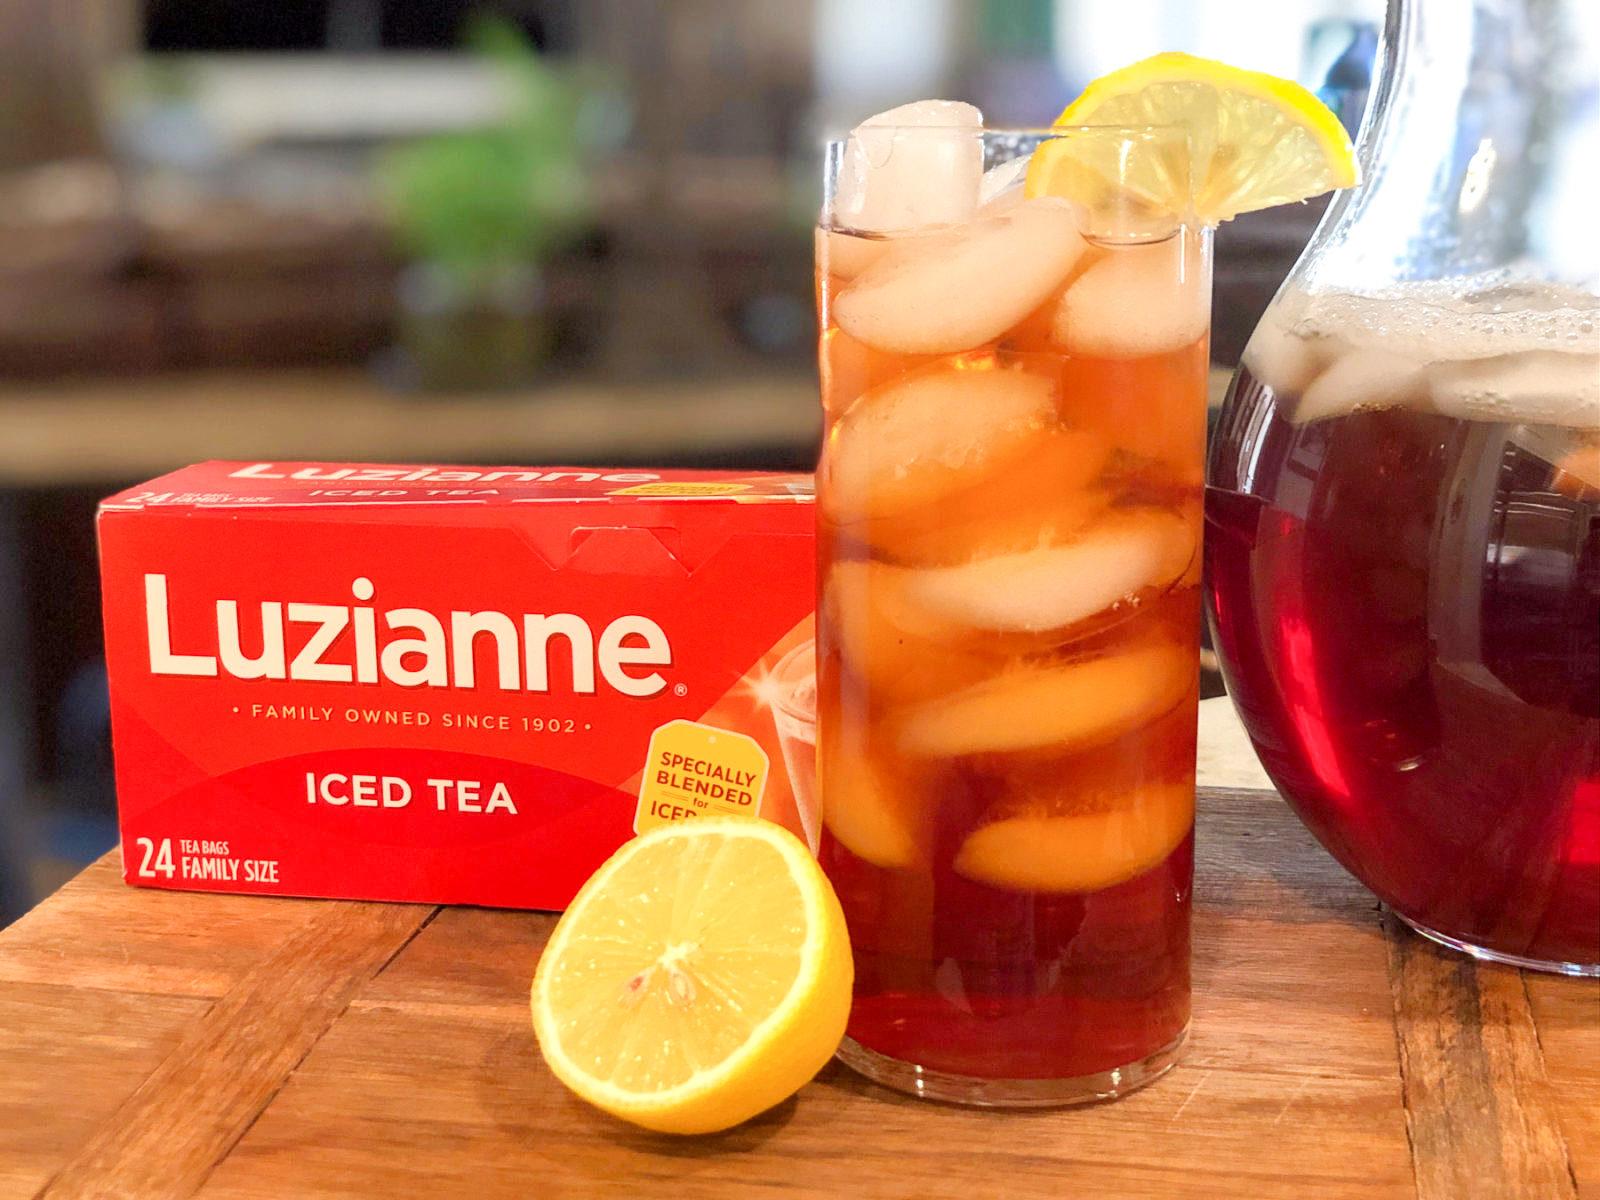 Luzianne Tea Just $1.40 Per Box At Publix on I Heart Publix